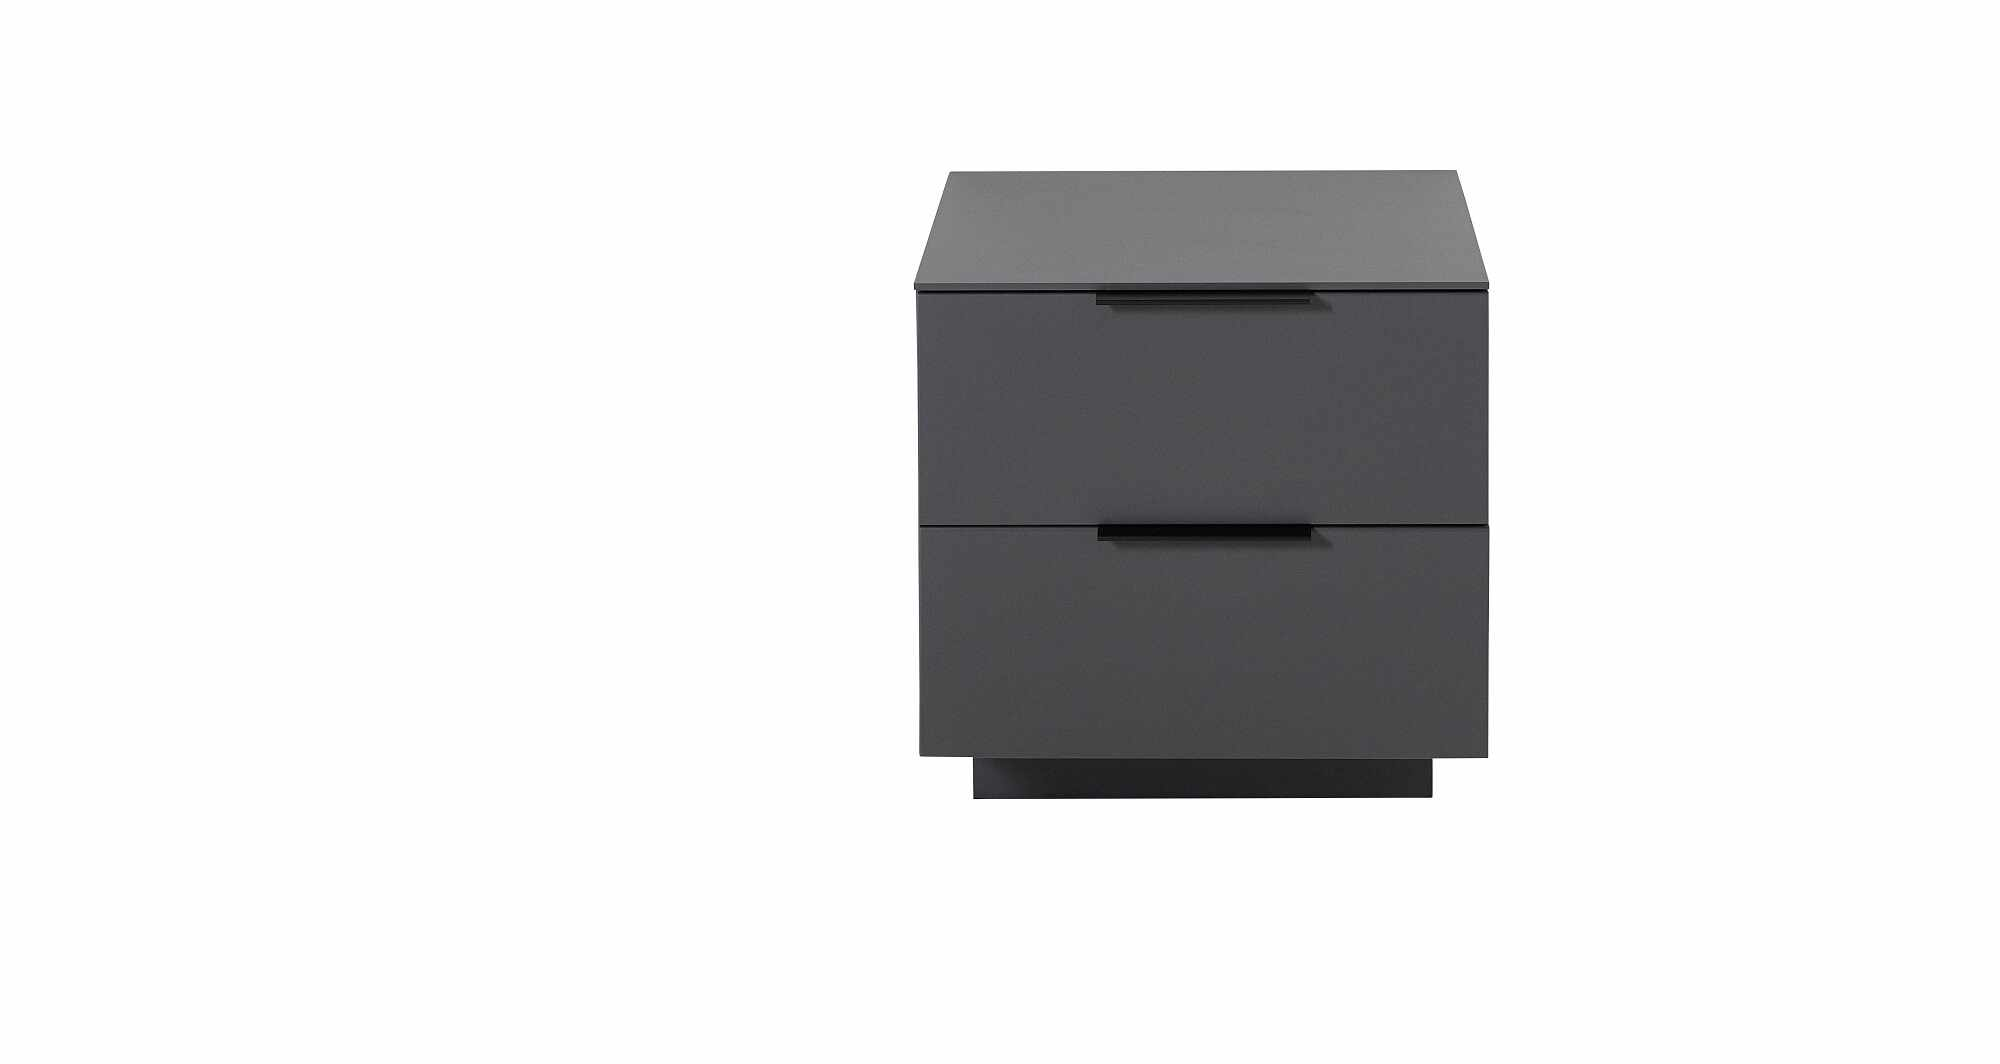 Cabinet din pal si MDF cu 2 sertare, Madeline Grafit, l60xA44xH61 cm la pret 868 lei